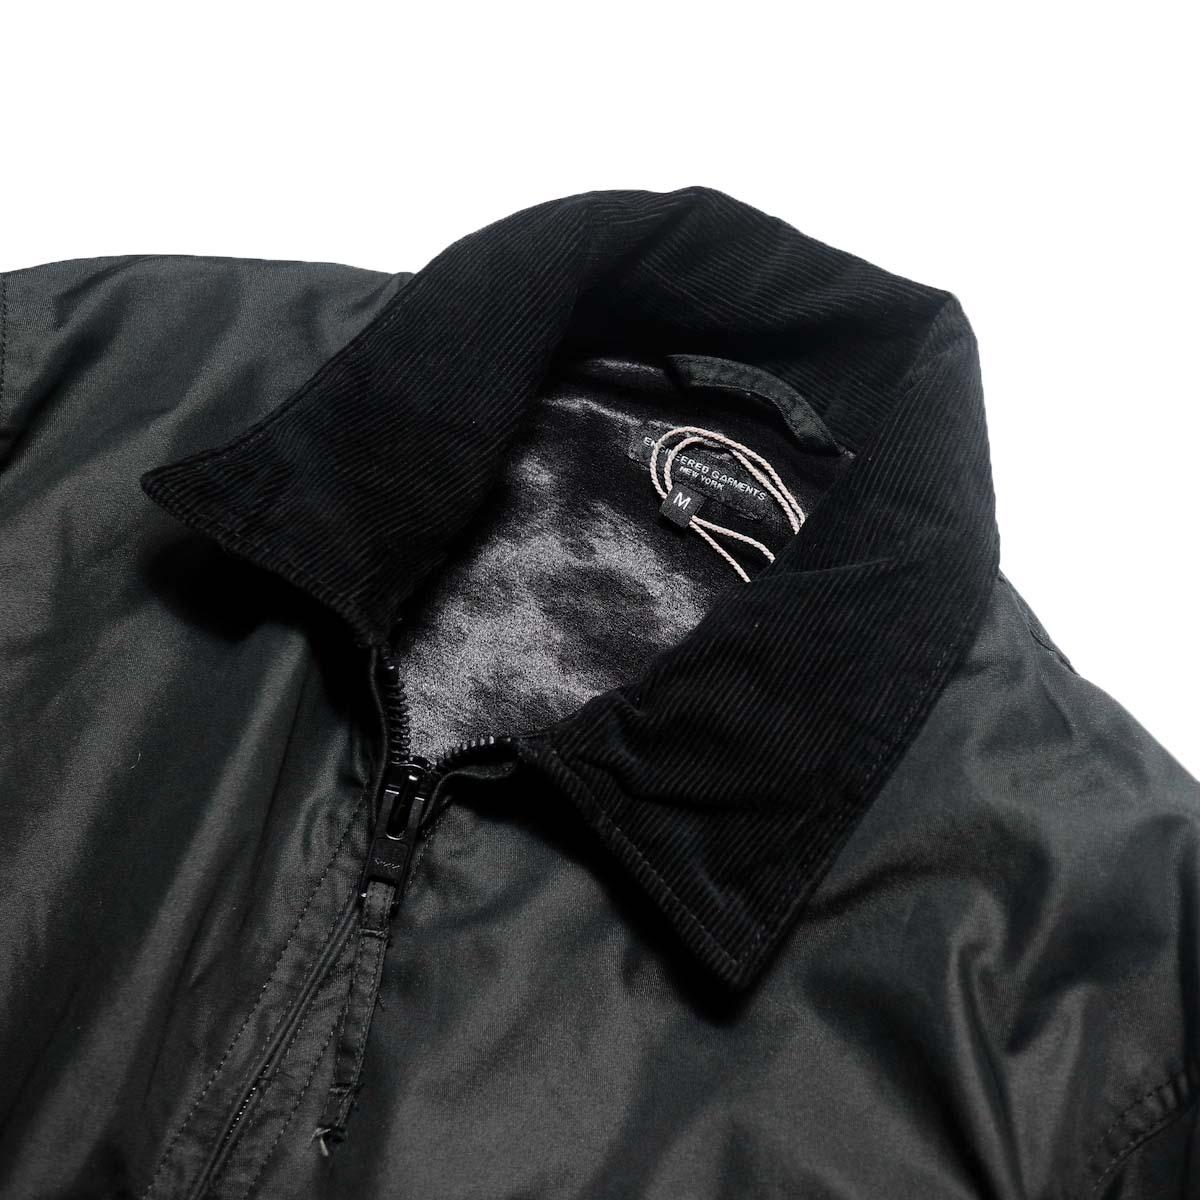 Engineered Garments / Driver Jacket - Pc Iridescent Twill (Black)襟